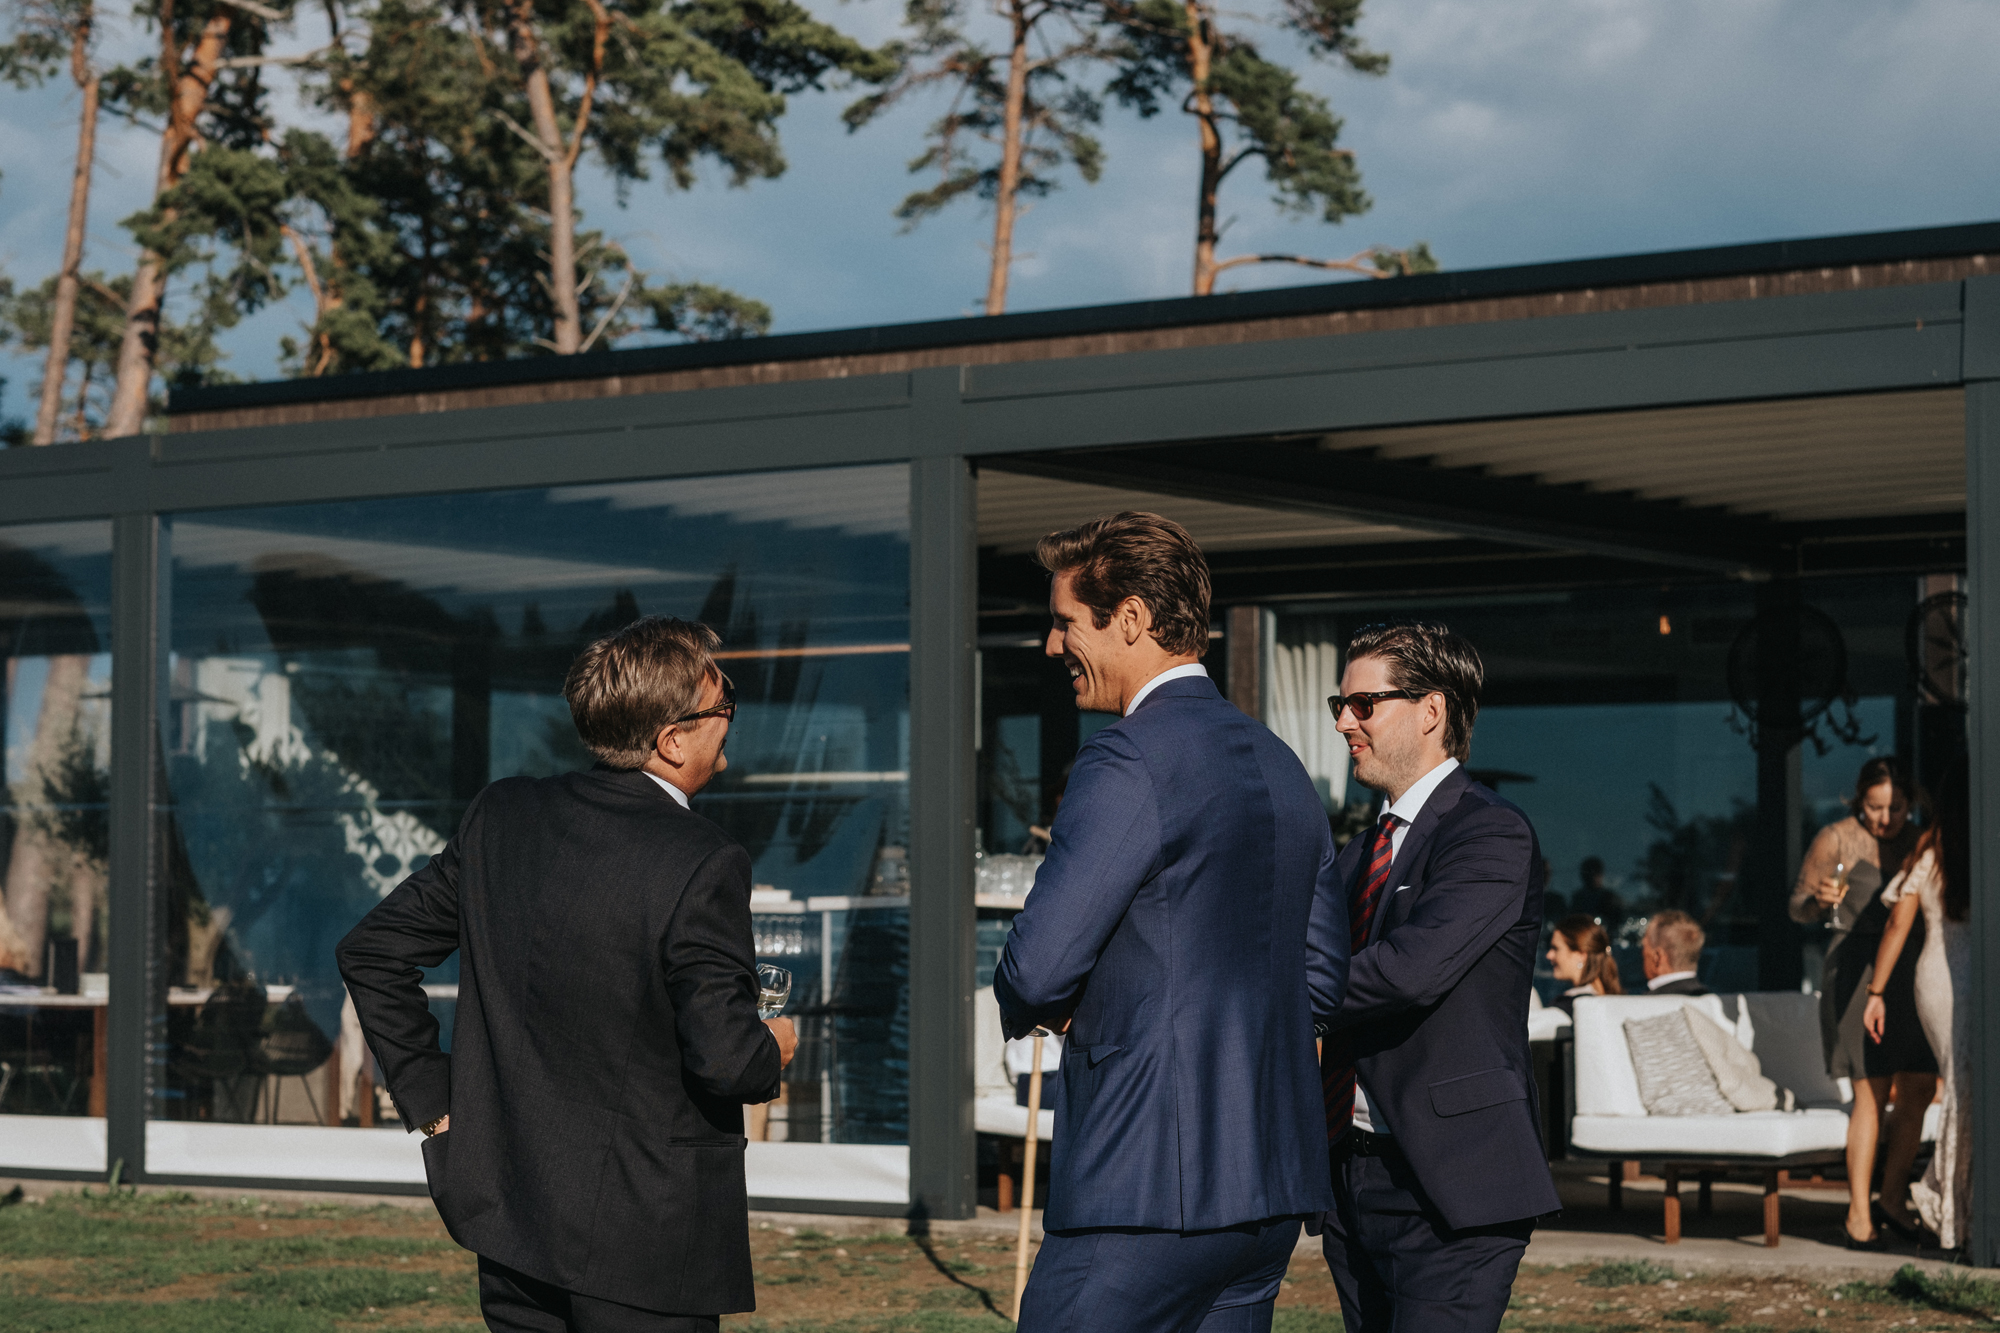 050-bröllop-djupvik-hotel-neas-fotografi.jpg